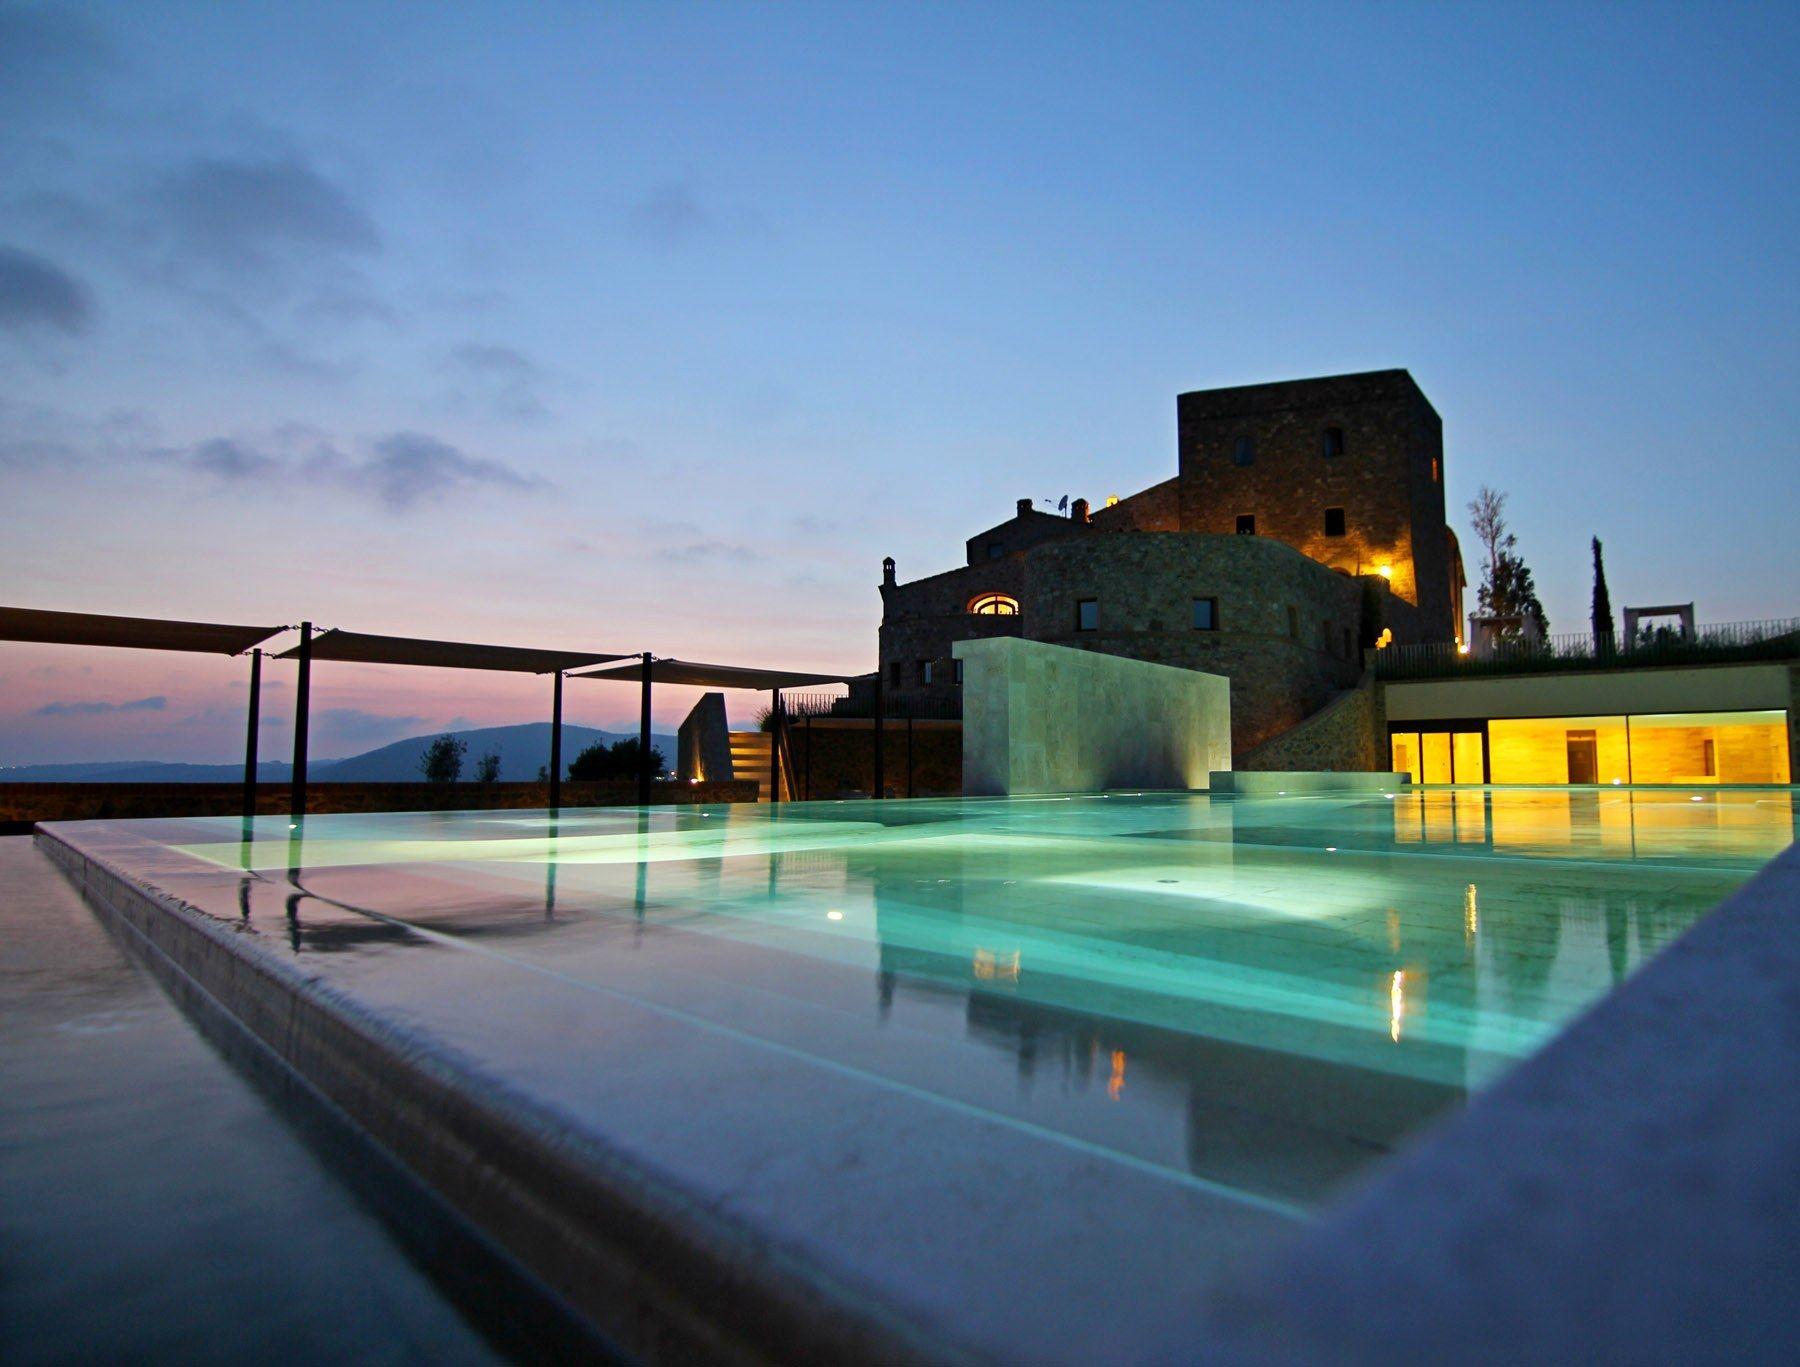 hotel-spa-castello-di-velona-montalcino-pool-view-17.jpg (1800×1367)